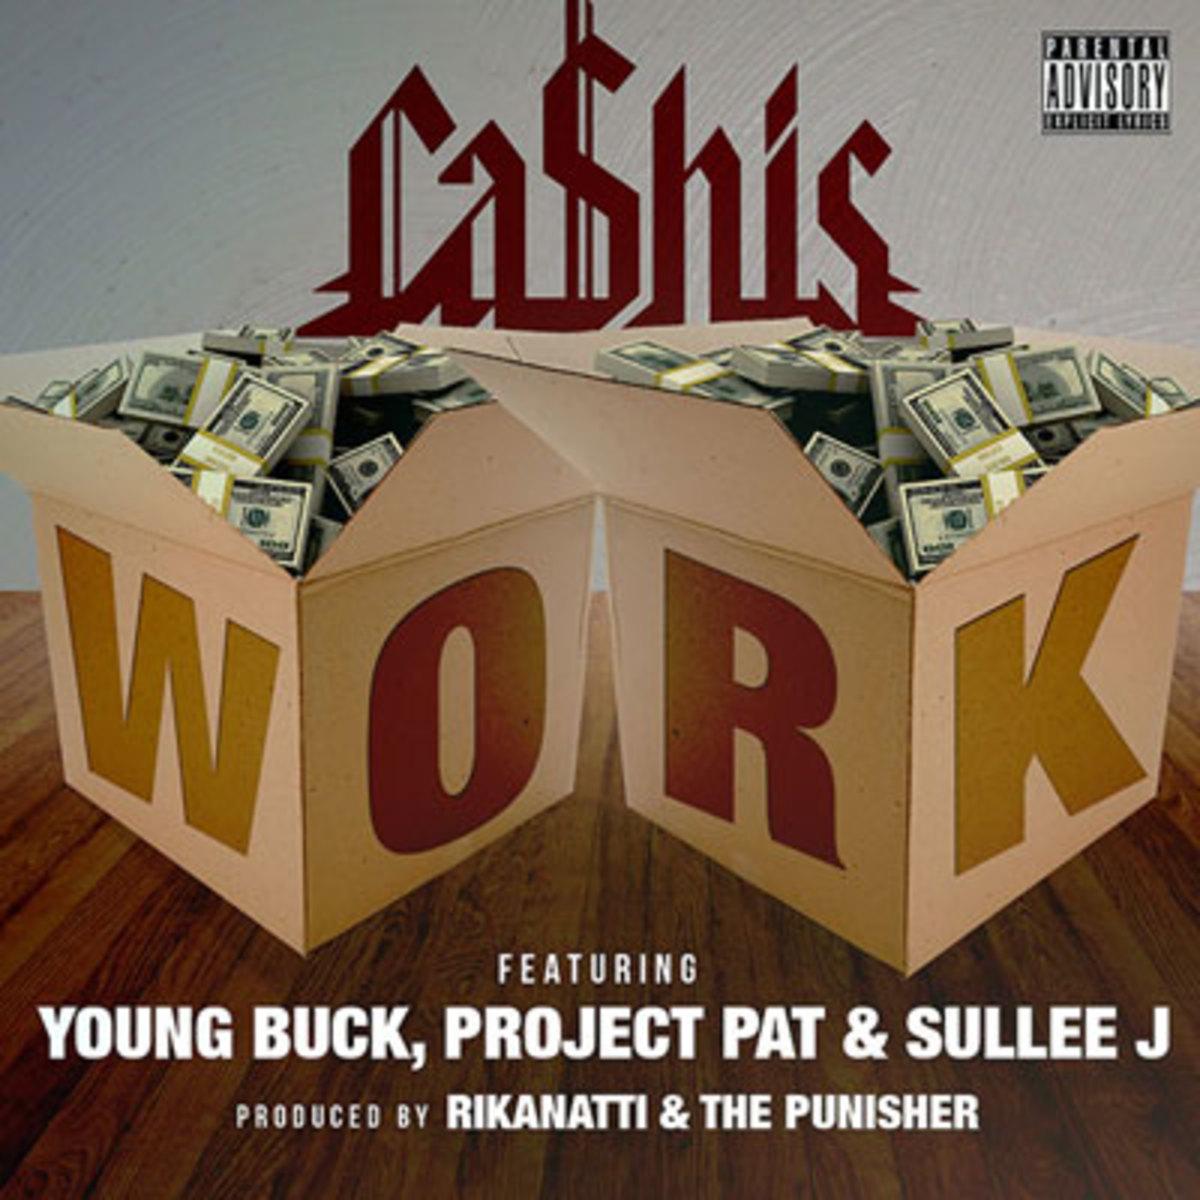 cashis-work.jpg